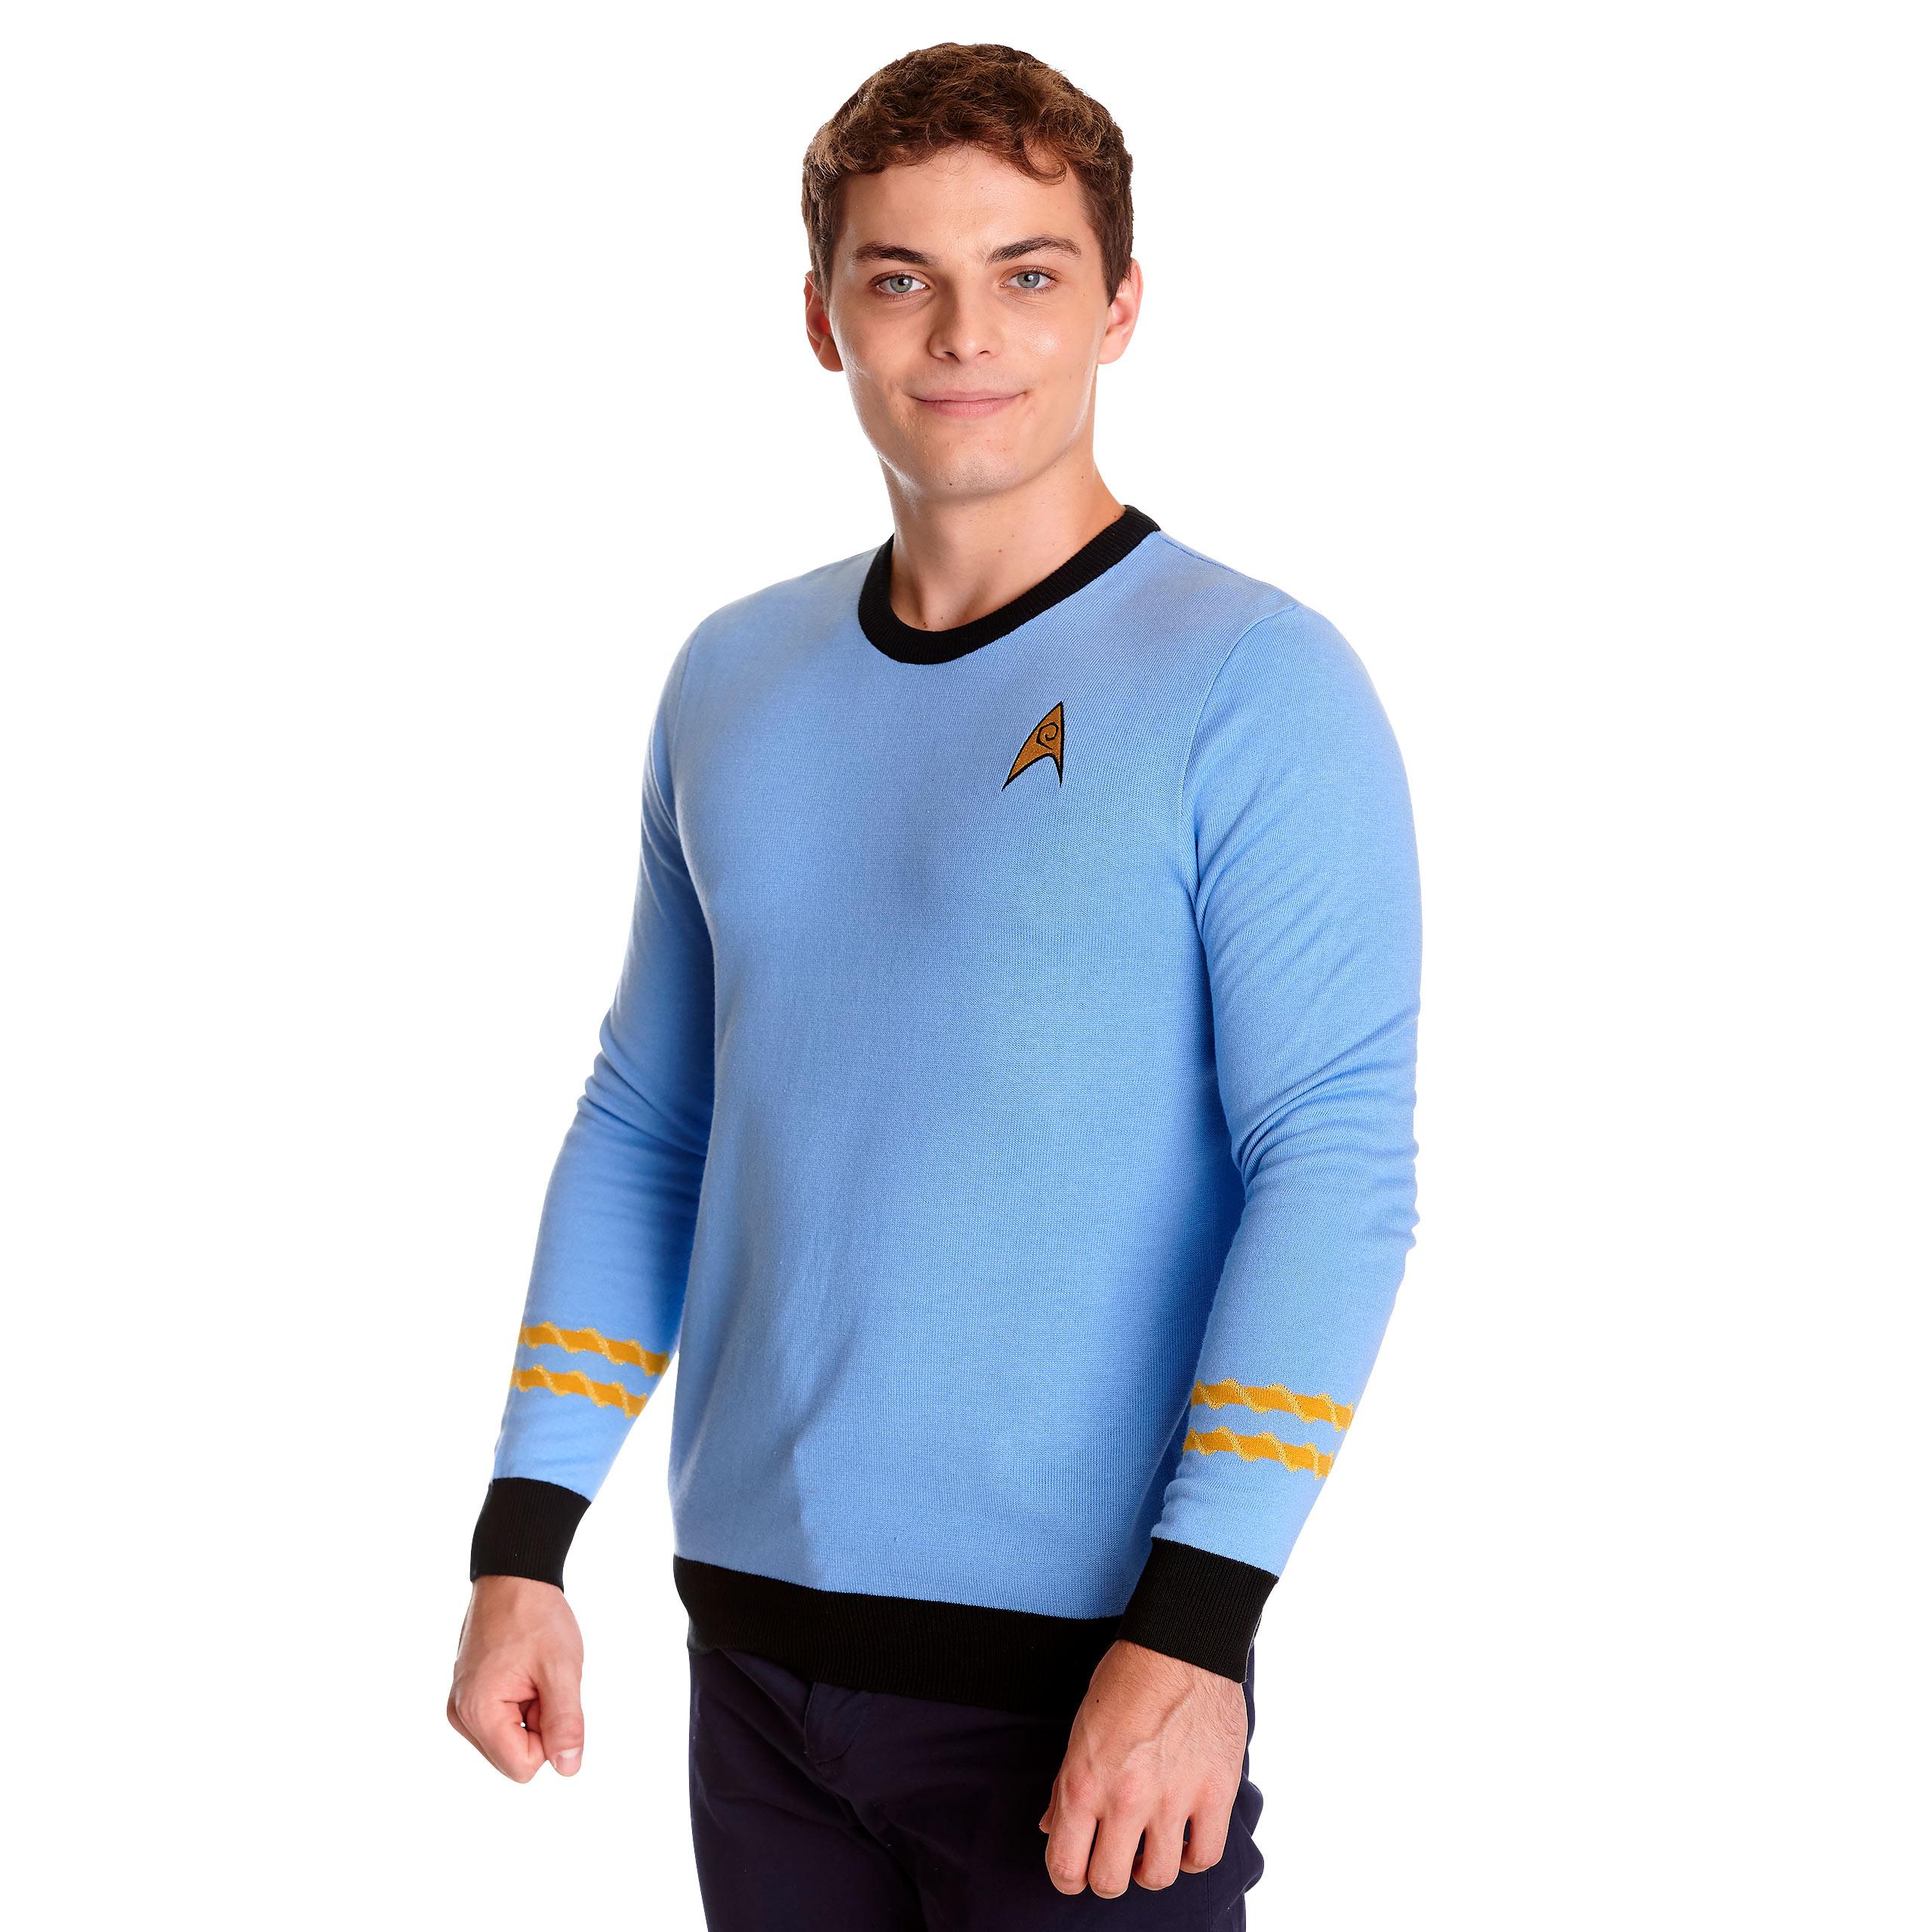 Star Trek - Mister Spock Uniform Strickpullover blau